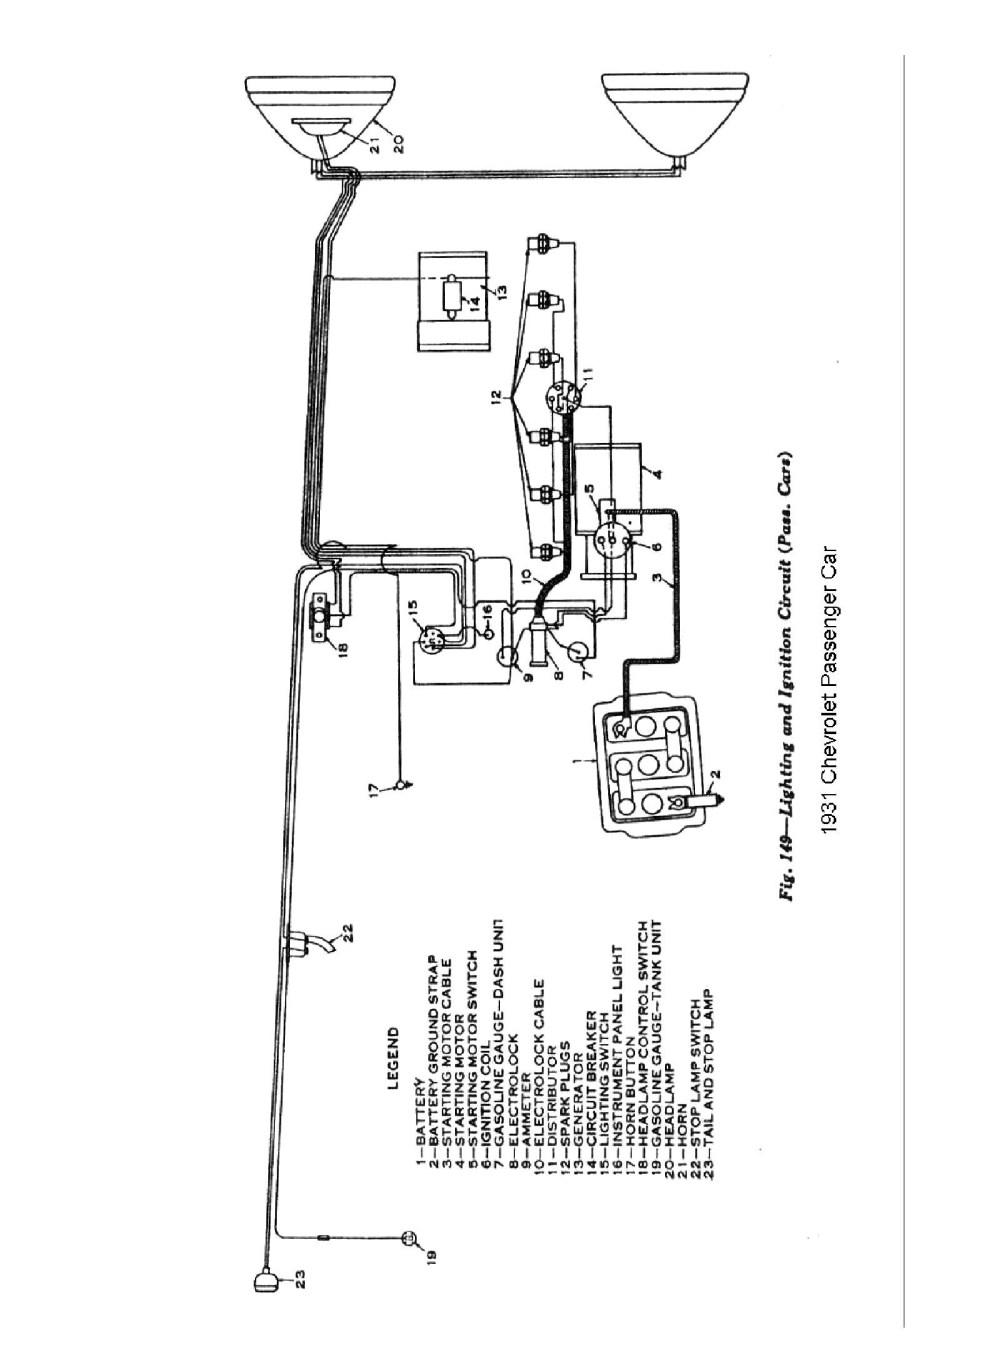 medium resolution of jeep wrangler engine diagram wiring diagram for ac unit thermostat 97 jeep grand cherokee engine diagram